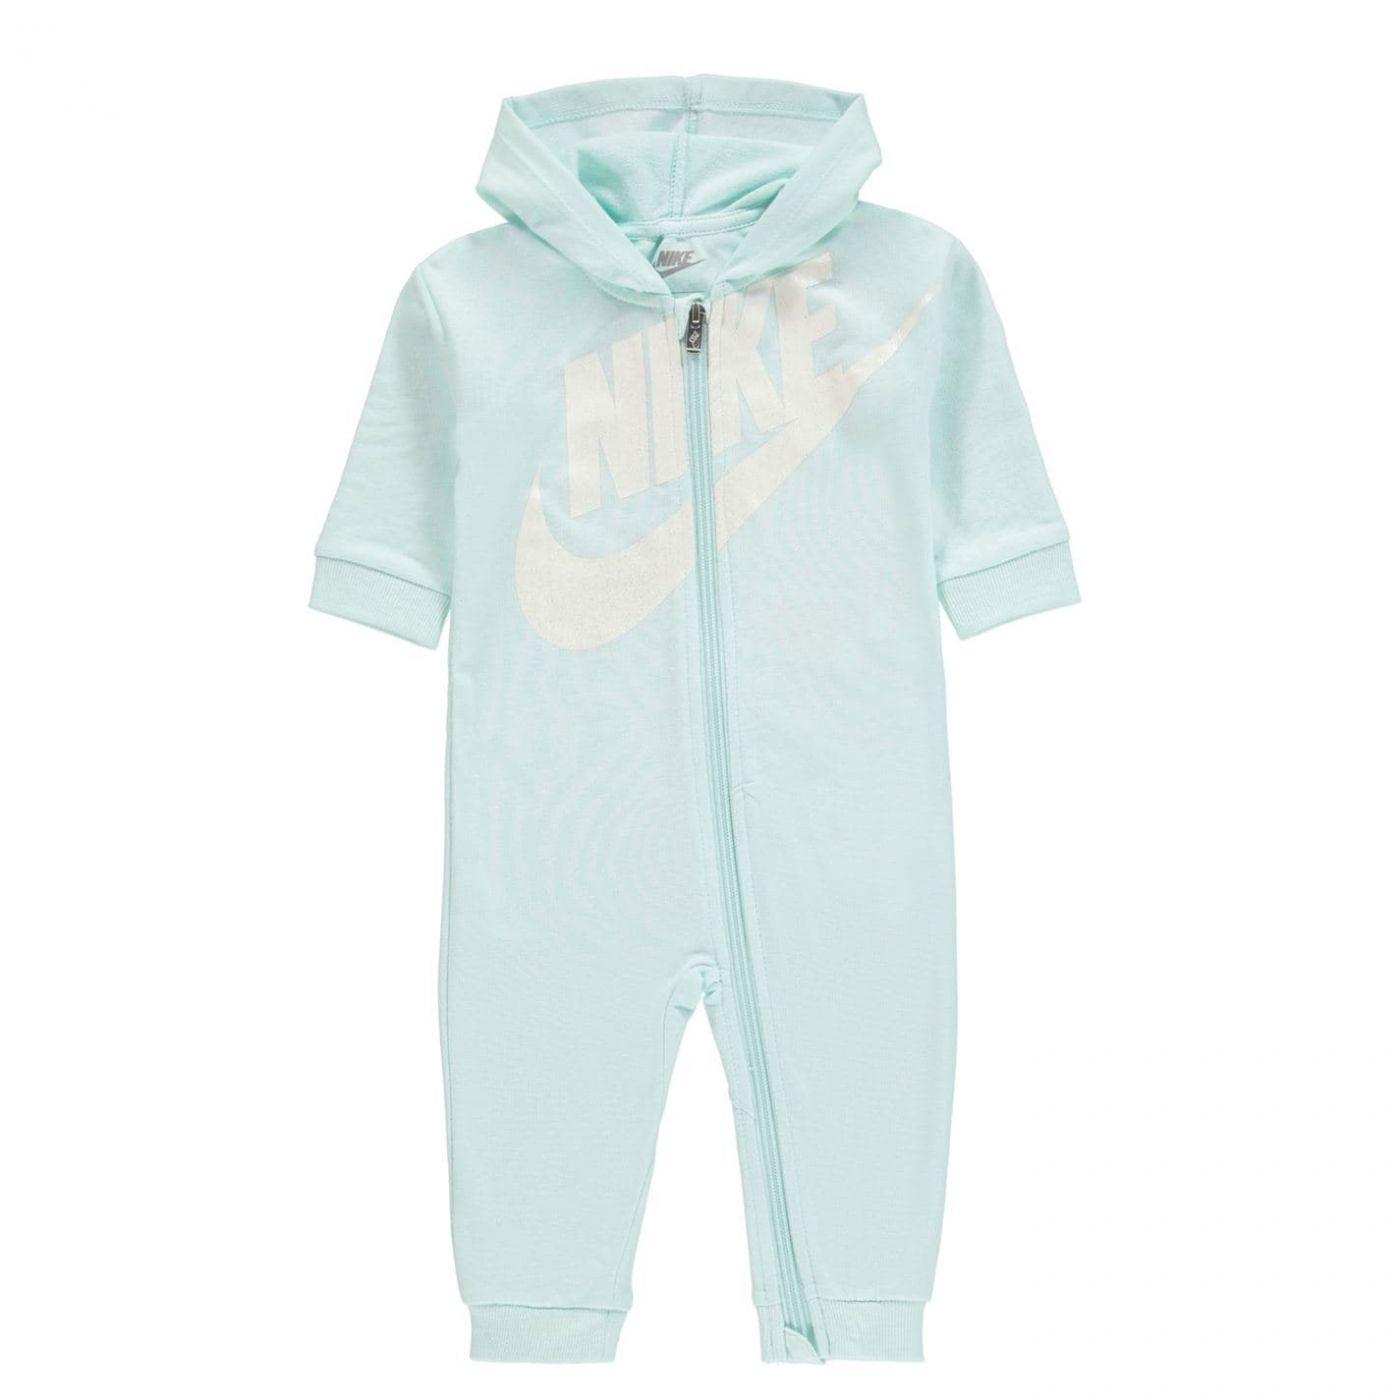 Nike Swoosh Romper Baby Girls